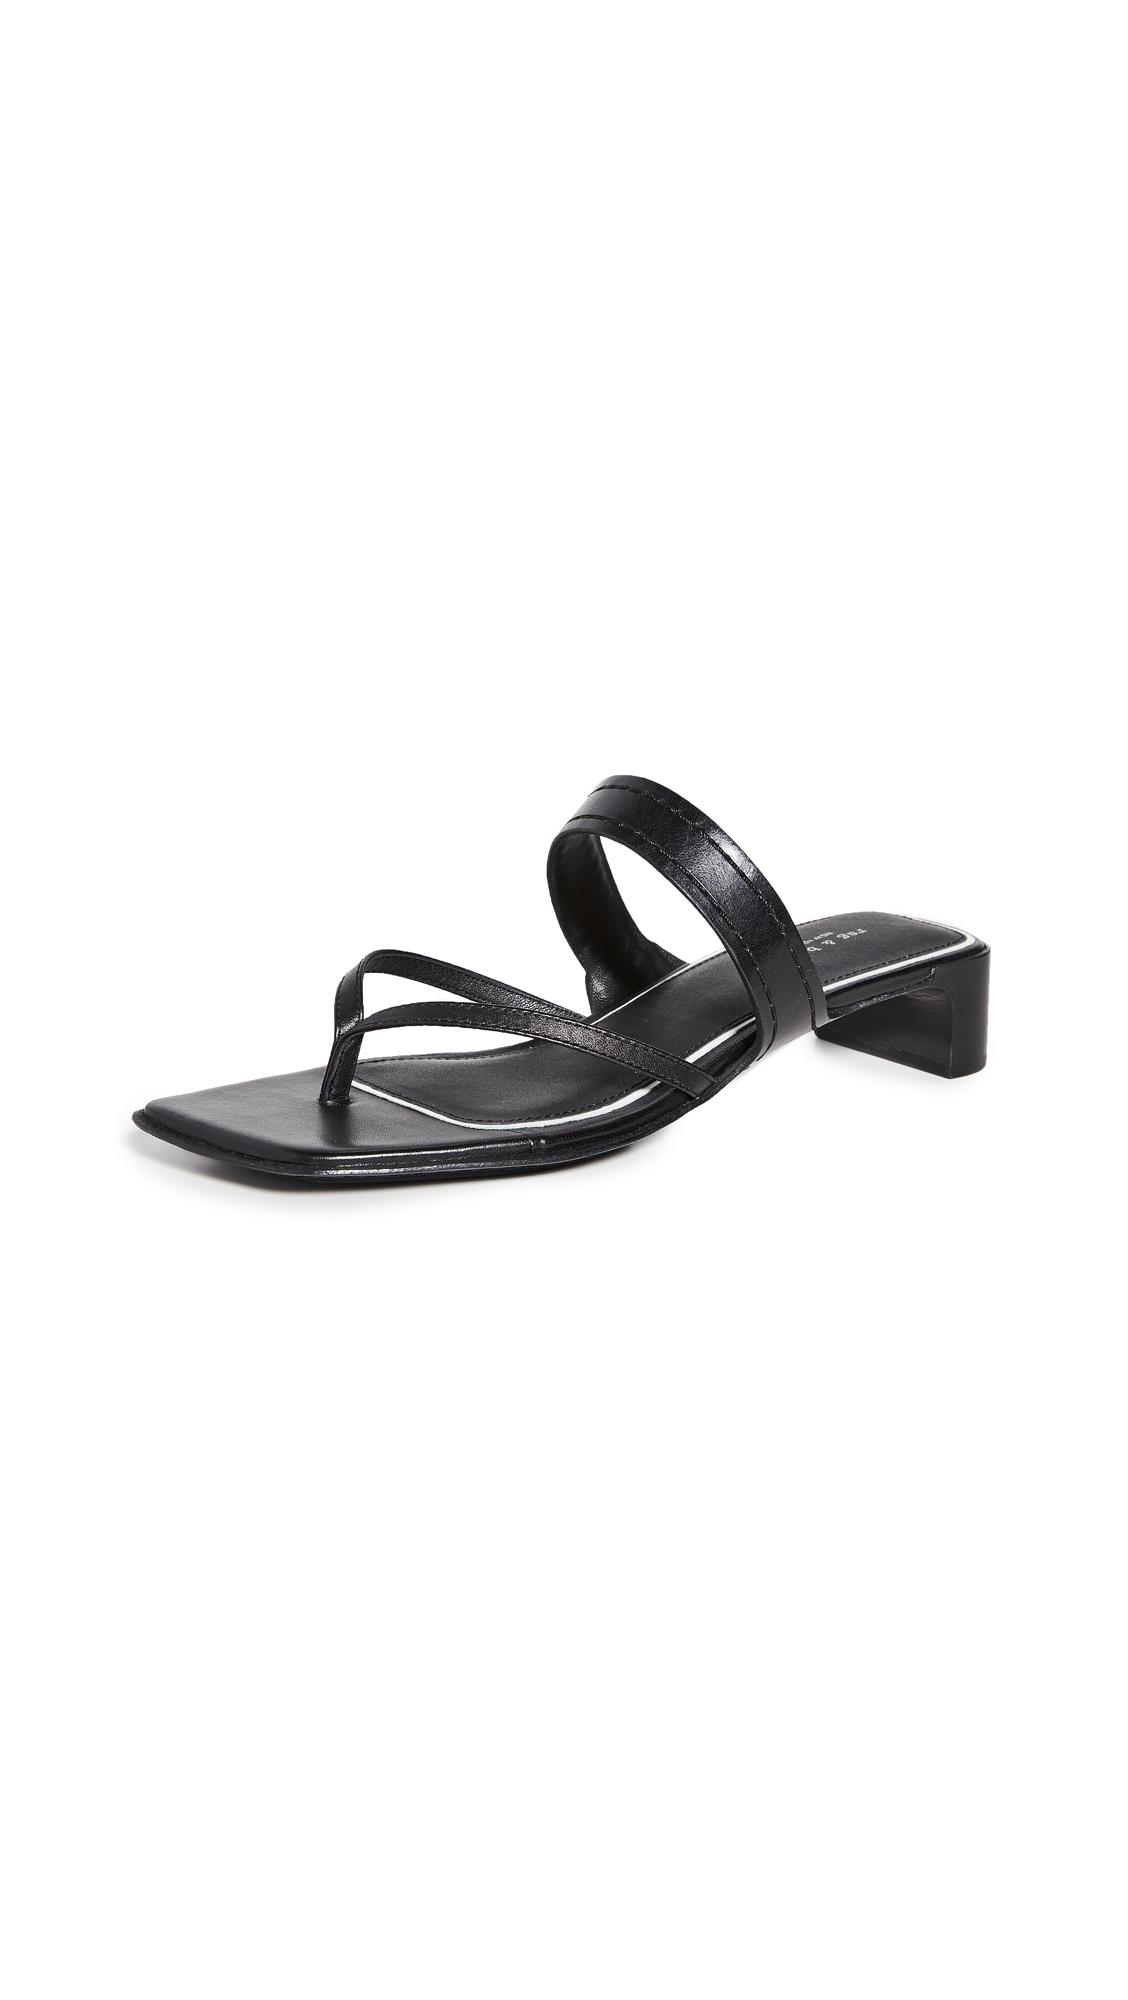 Rag & Bone Colt Mid Sandals - 50% Off Sale